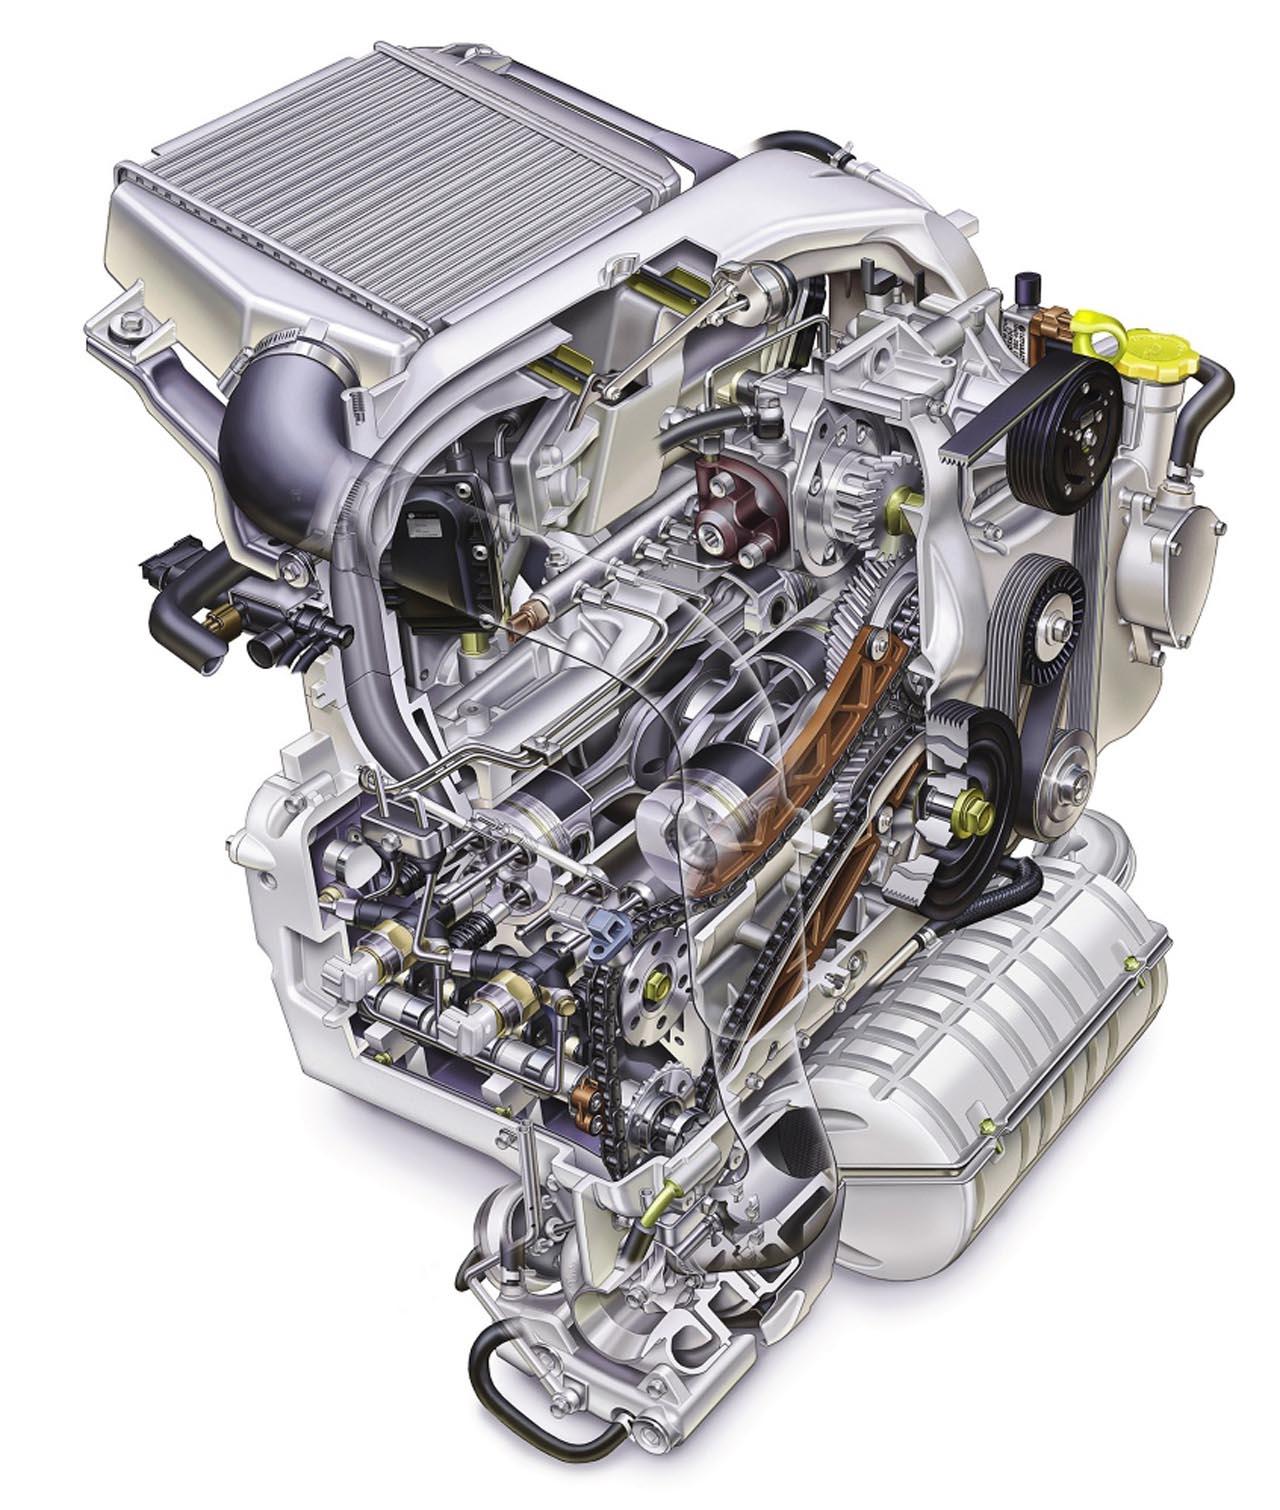 Silnik 2 0D Subaru – problemy awarie historia eksploatacja